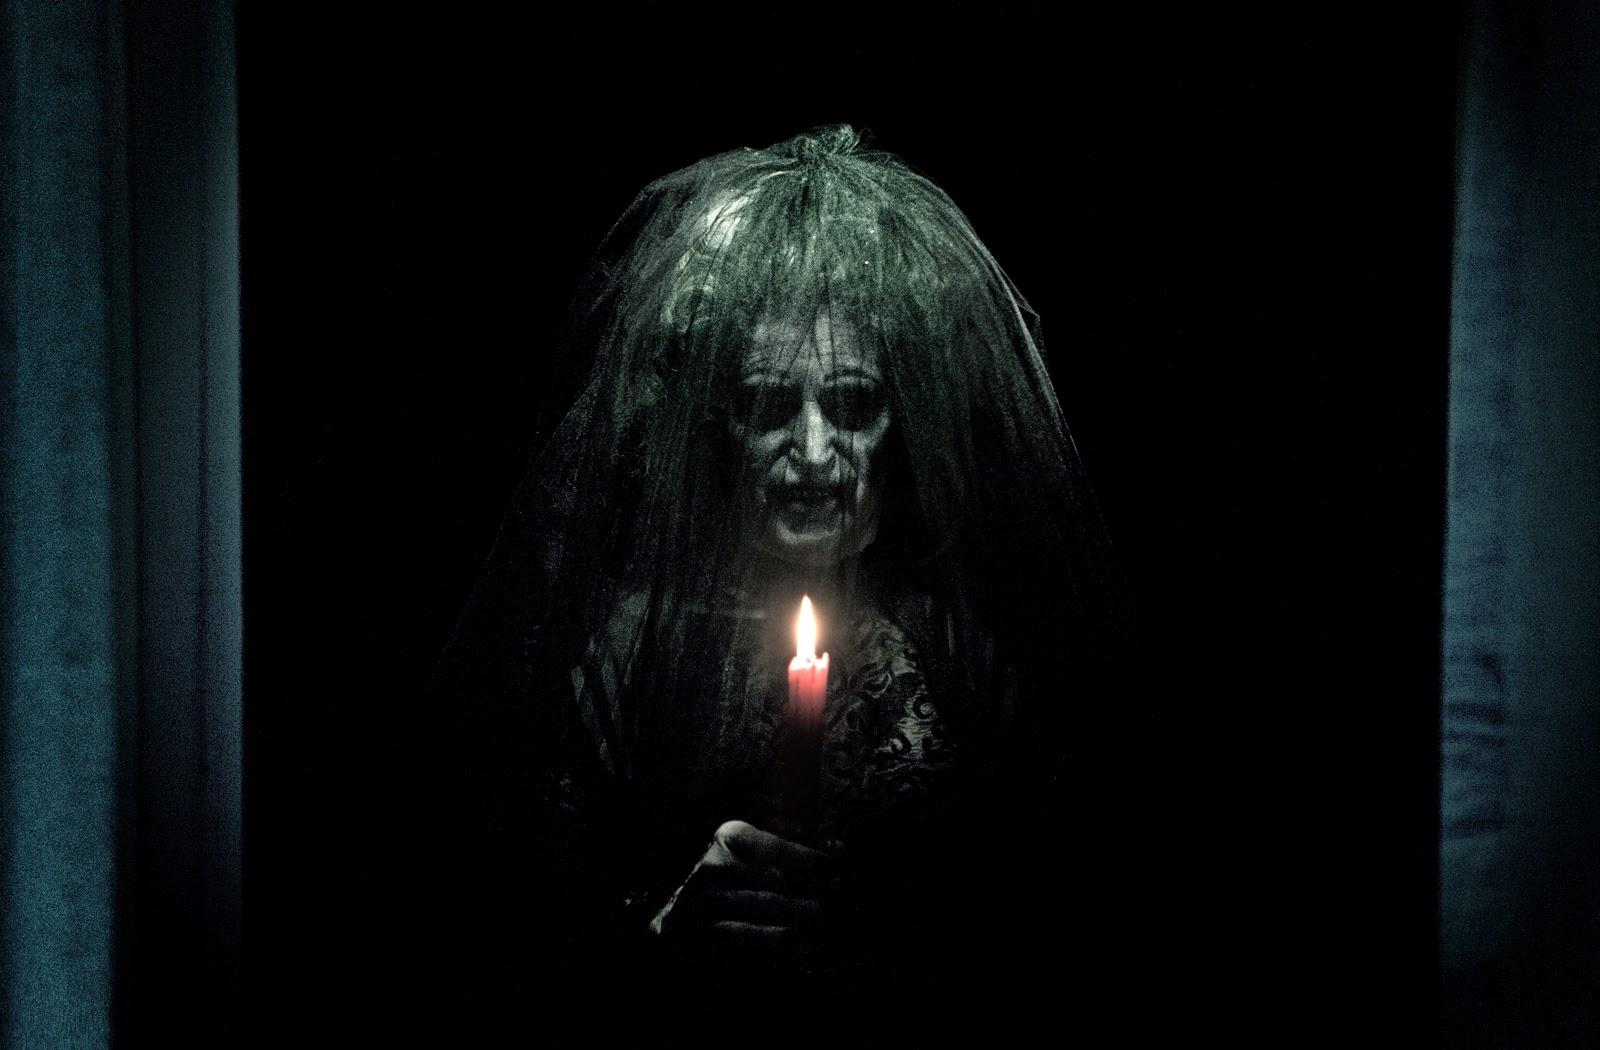 Creepy Old Woman.jpg